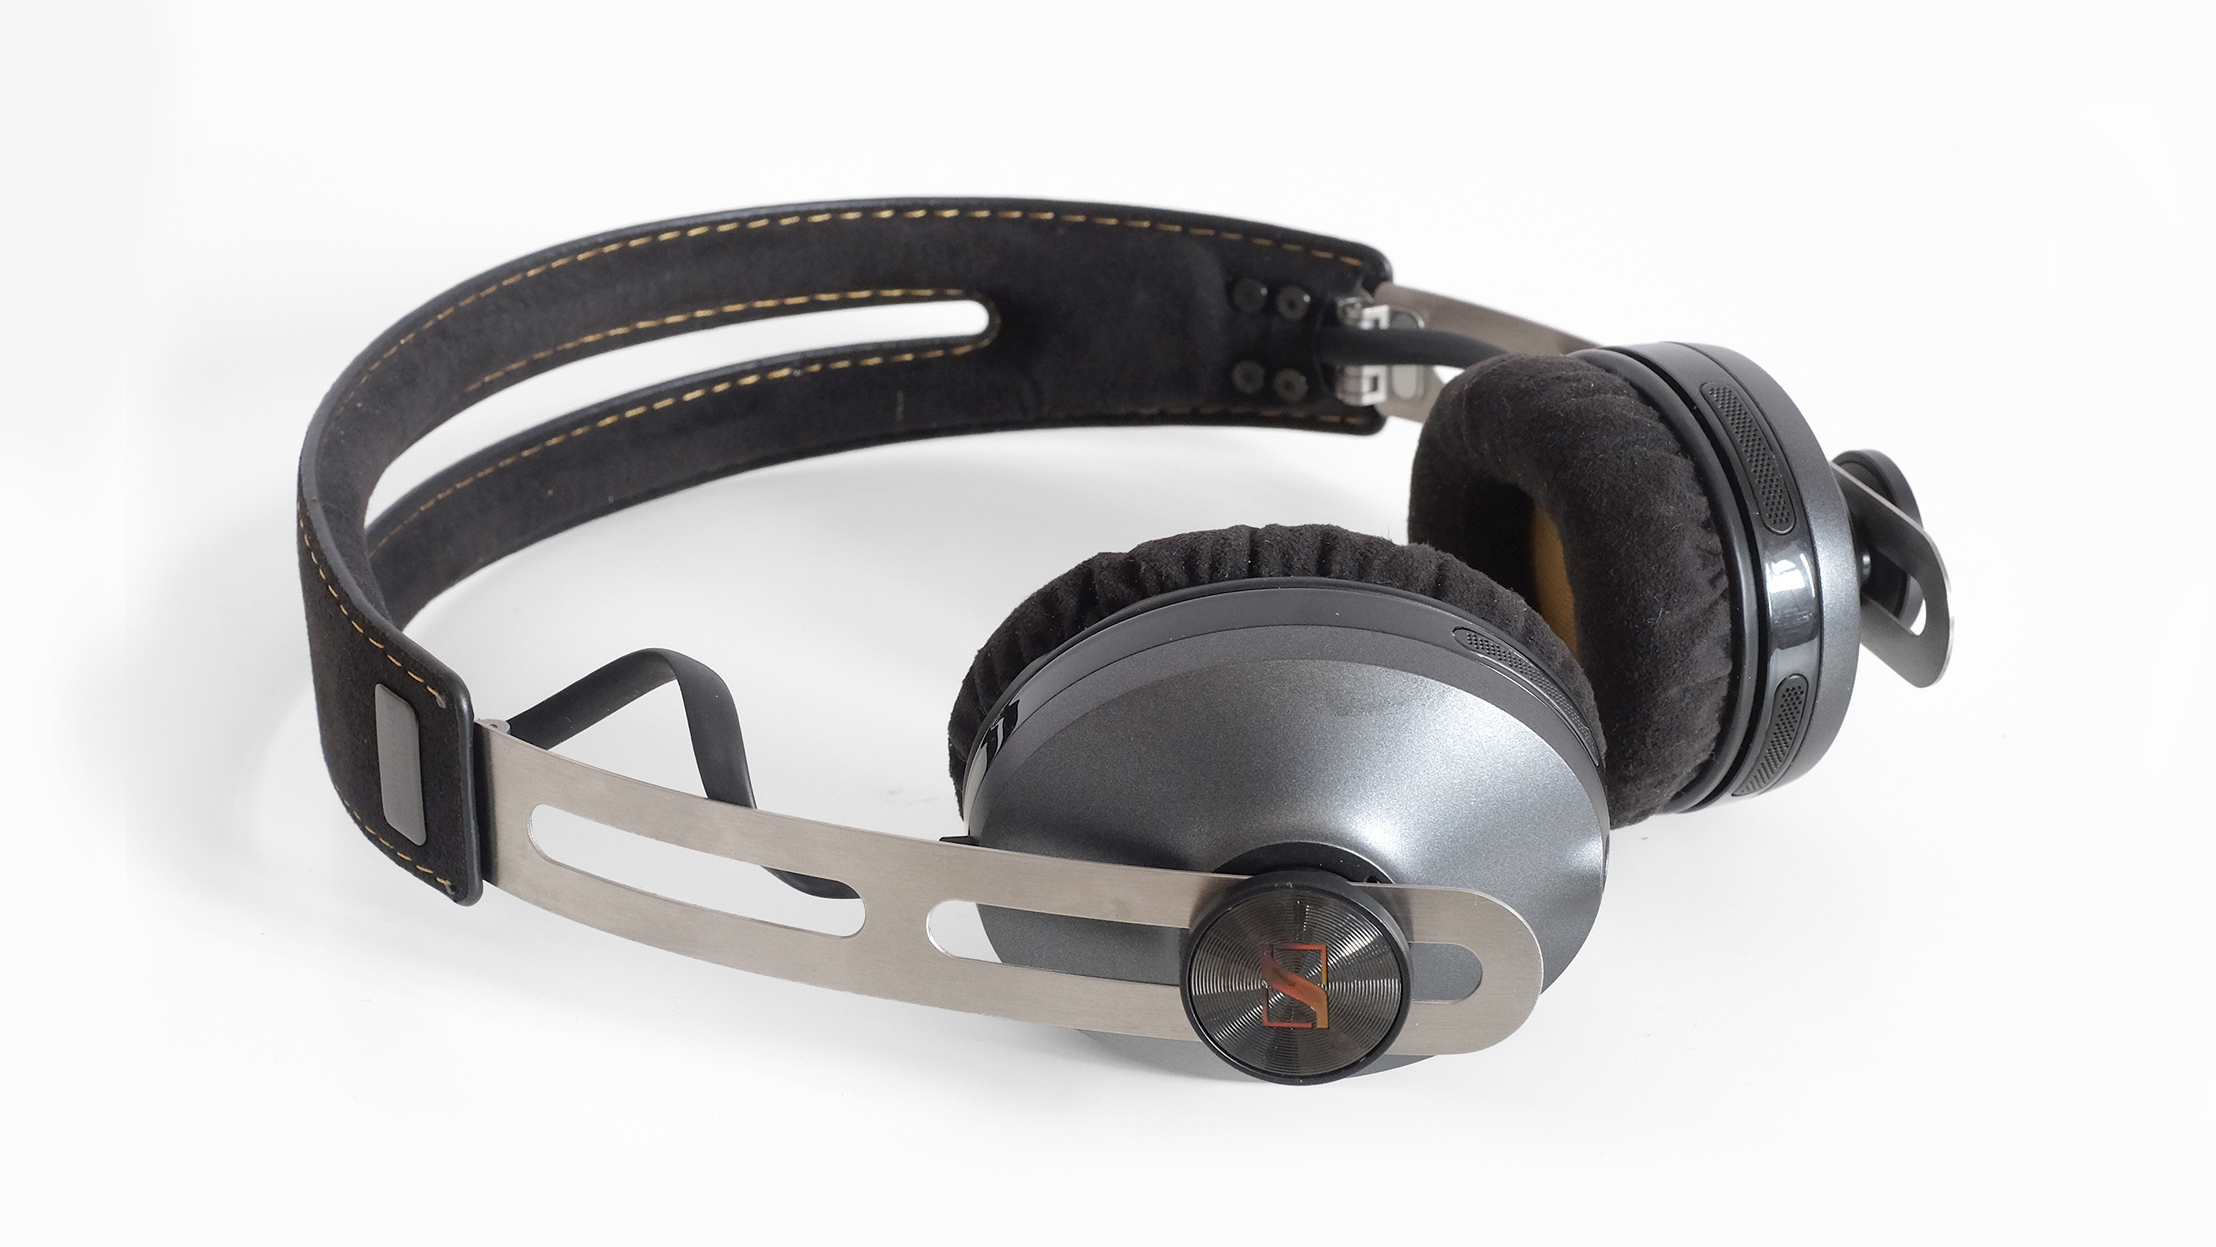 Sennheiser Momentum 2 On Ear Wireless Techradar Beats Headphone Solo Hd1